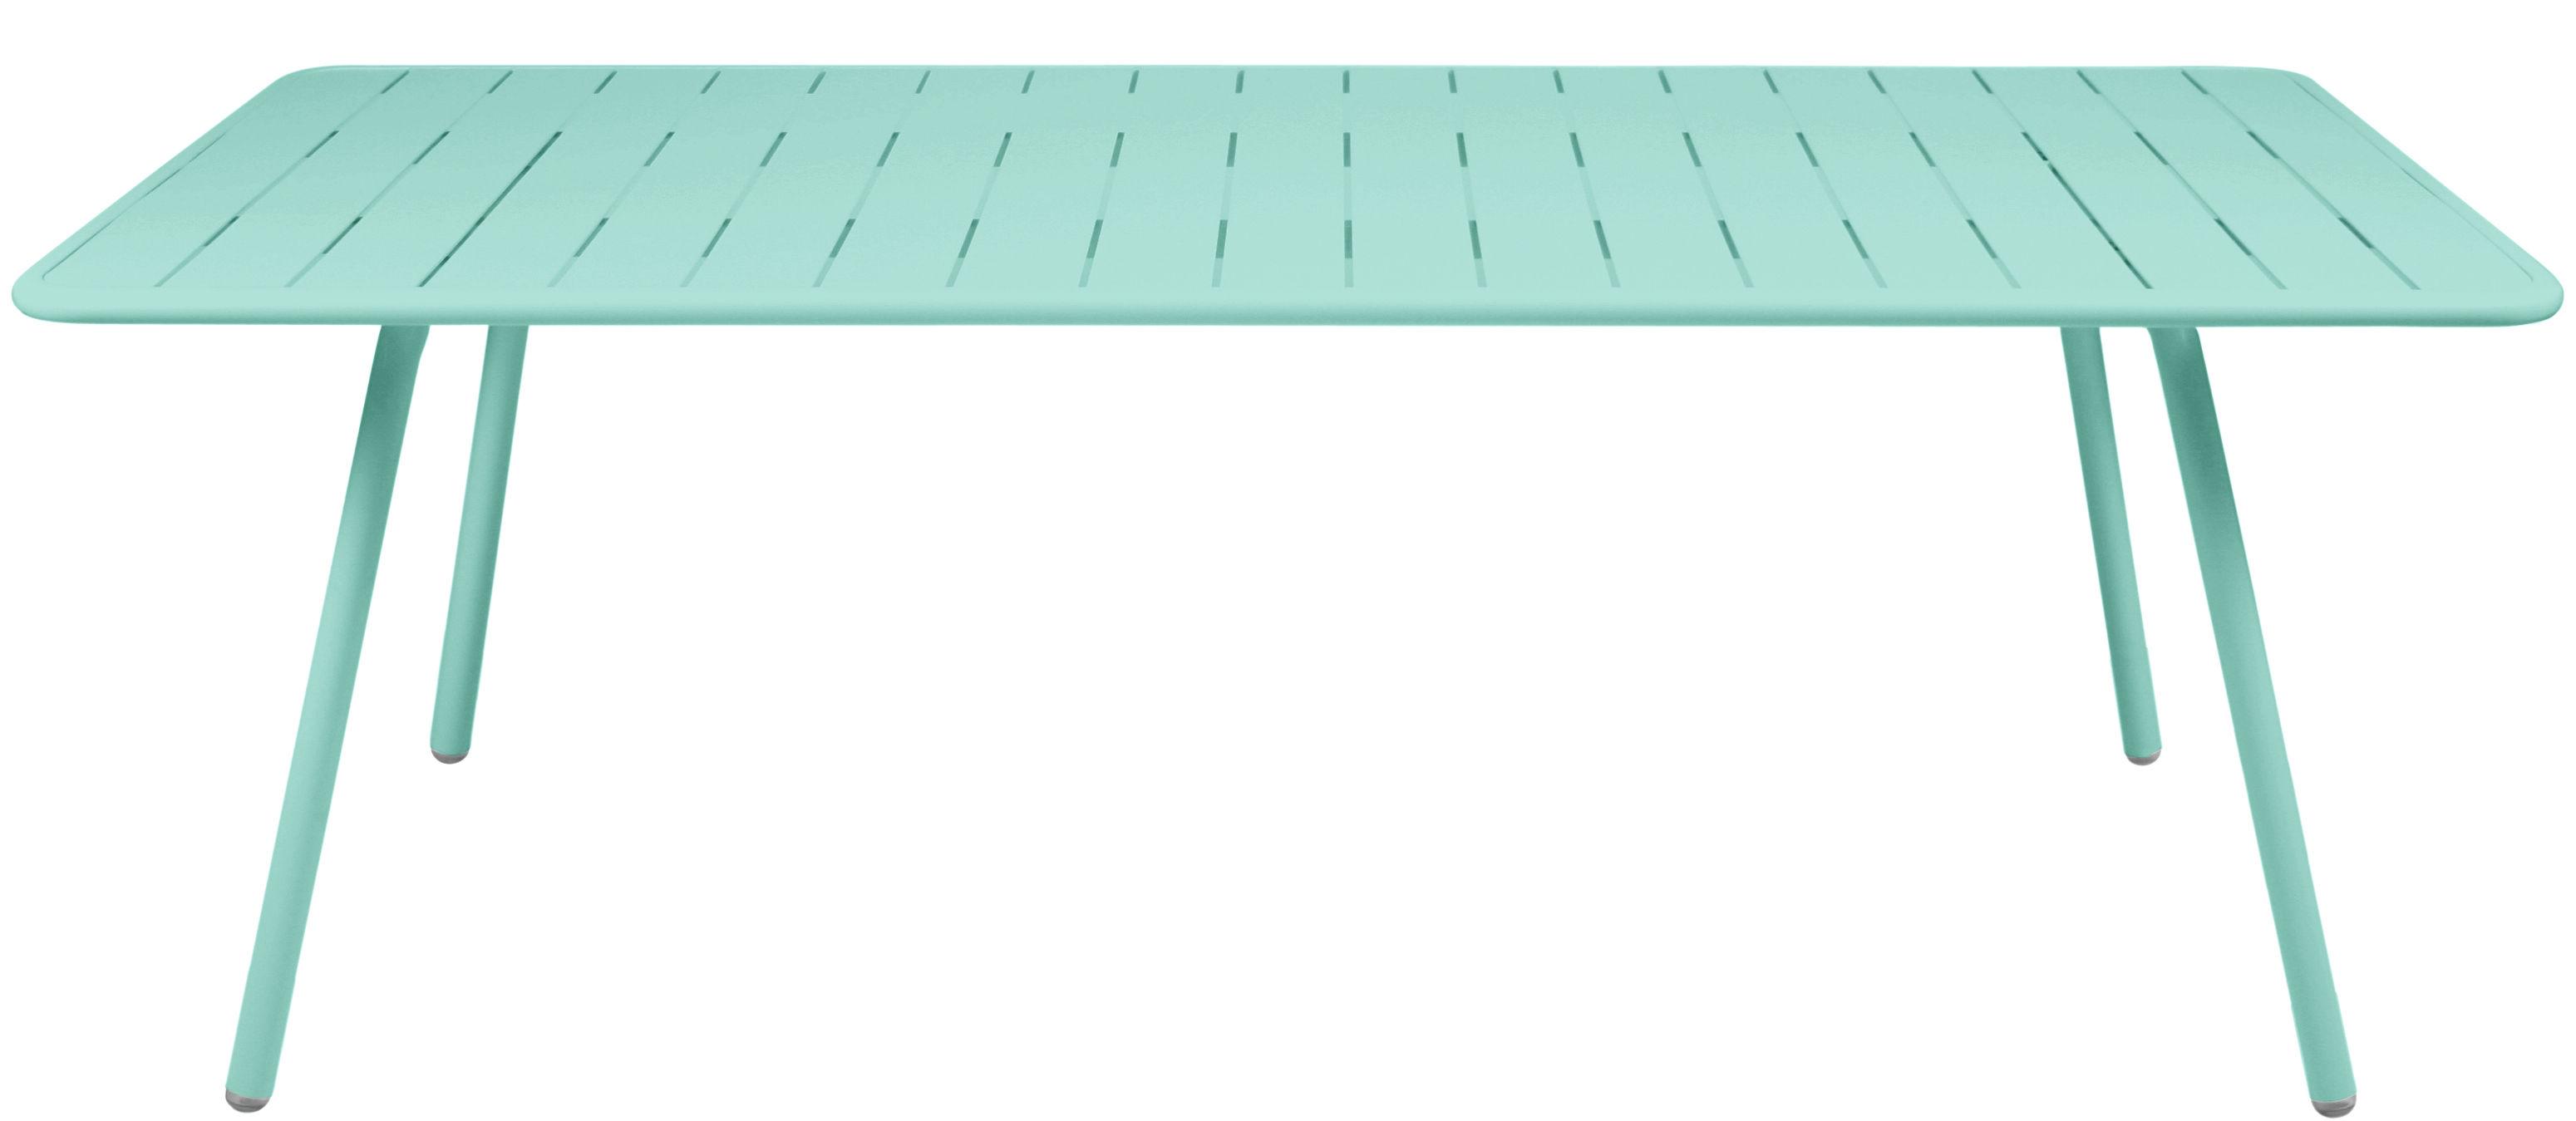 luxembourg f r 8 personen 207 x 100 cm fermob tisch. Black Bedroom Furniture Sets. Home Design Ideas